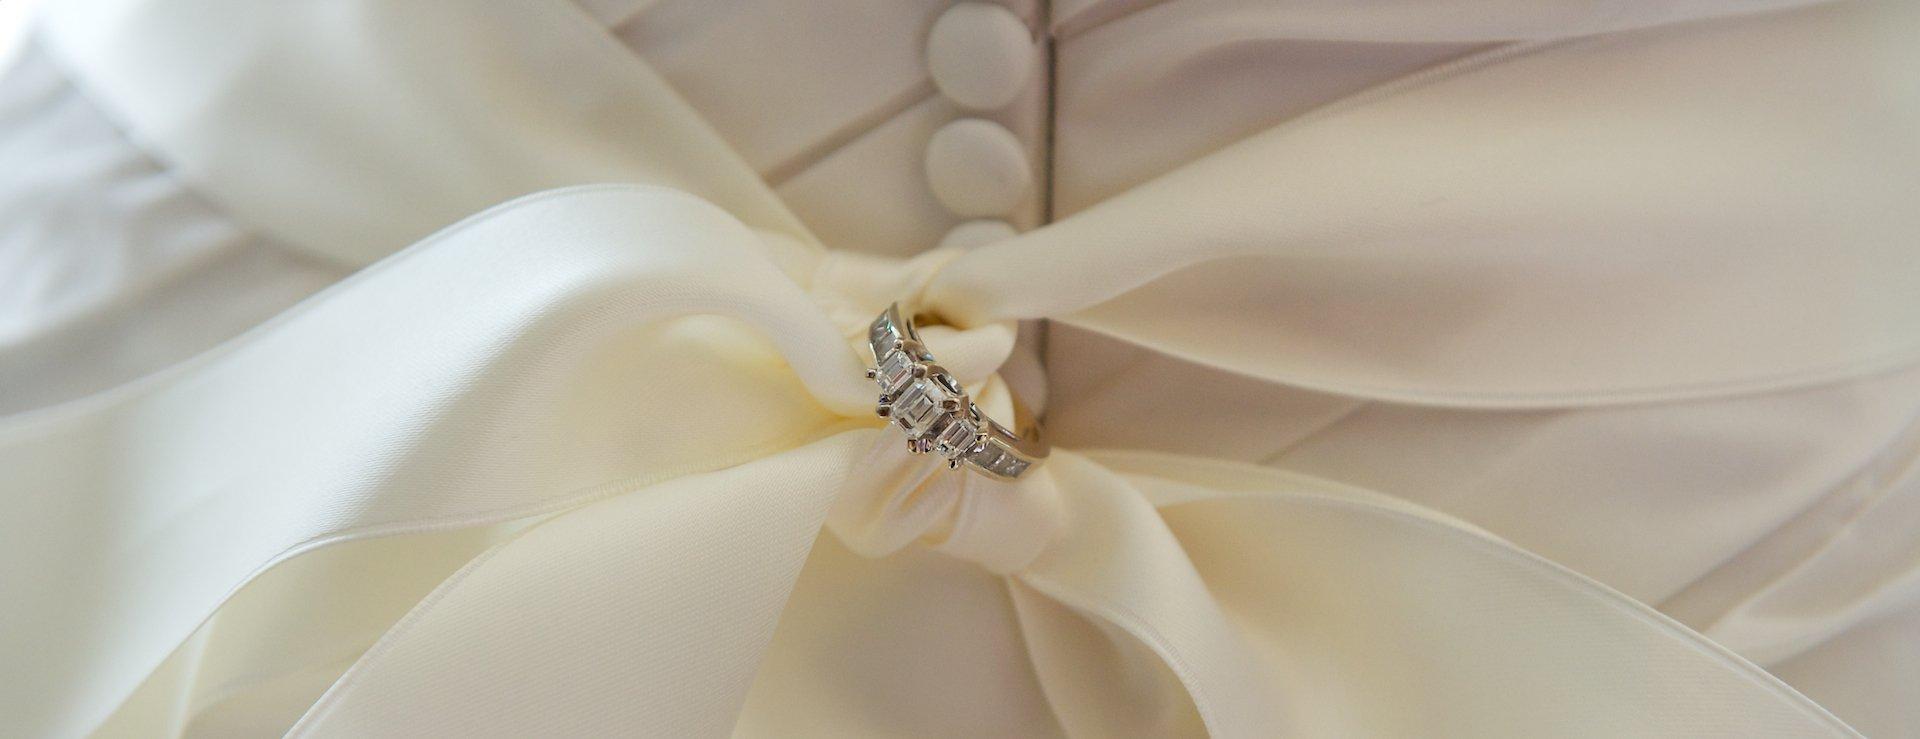 Wedding details at the Scottish Rite